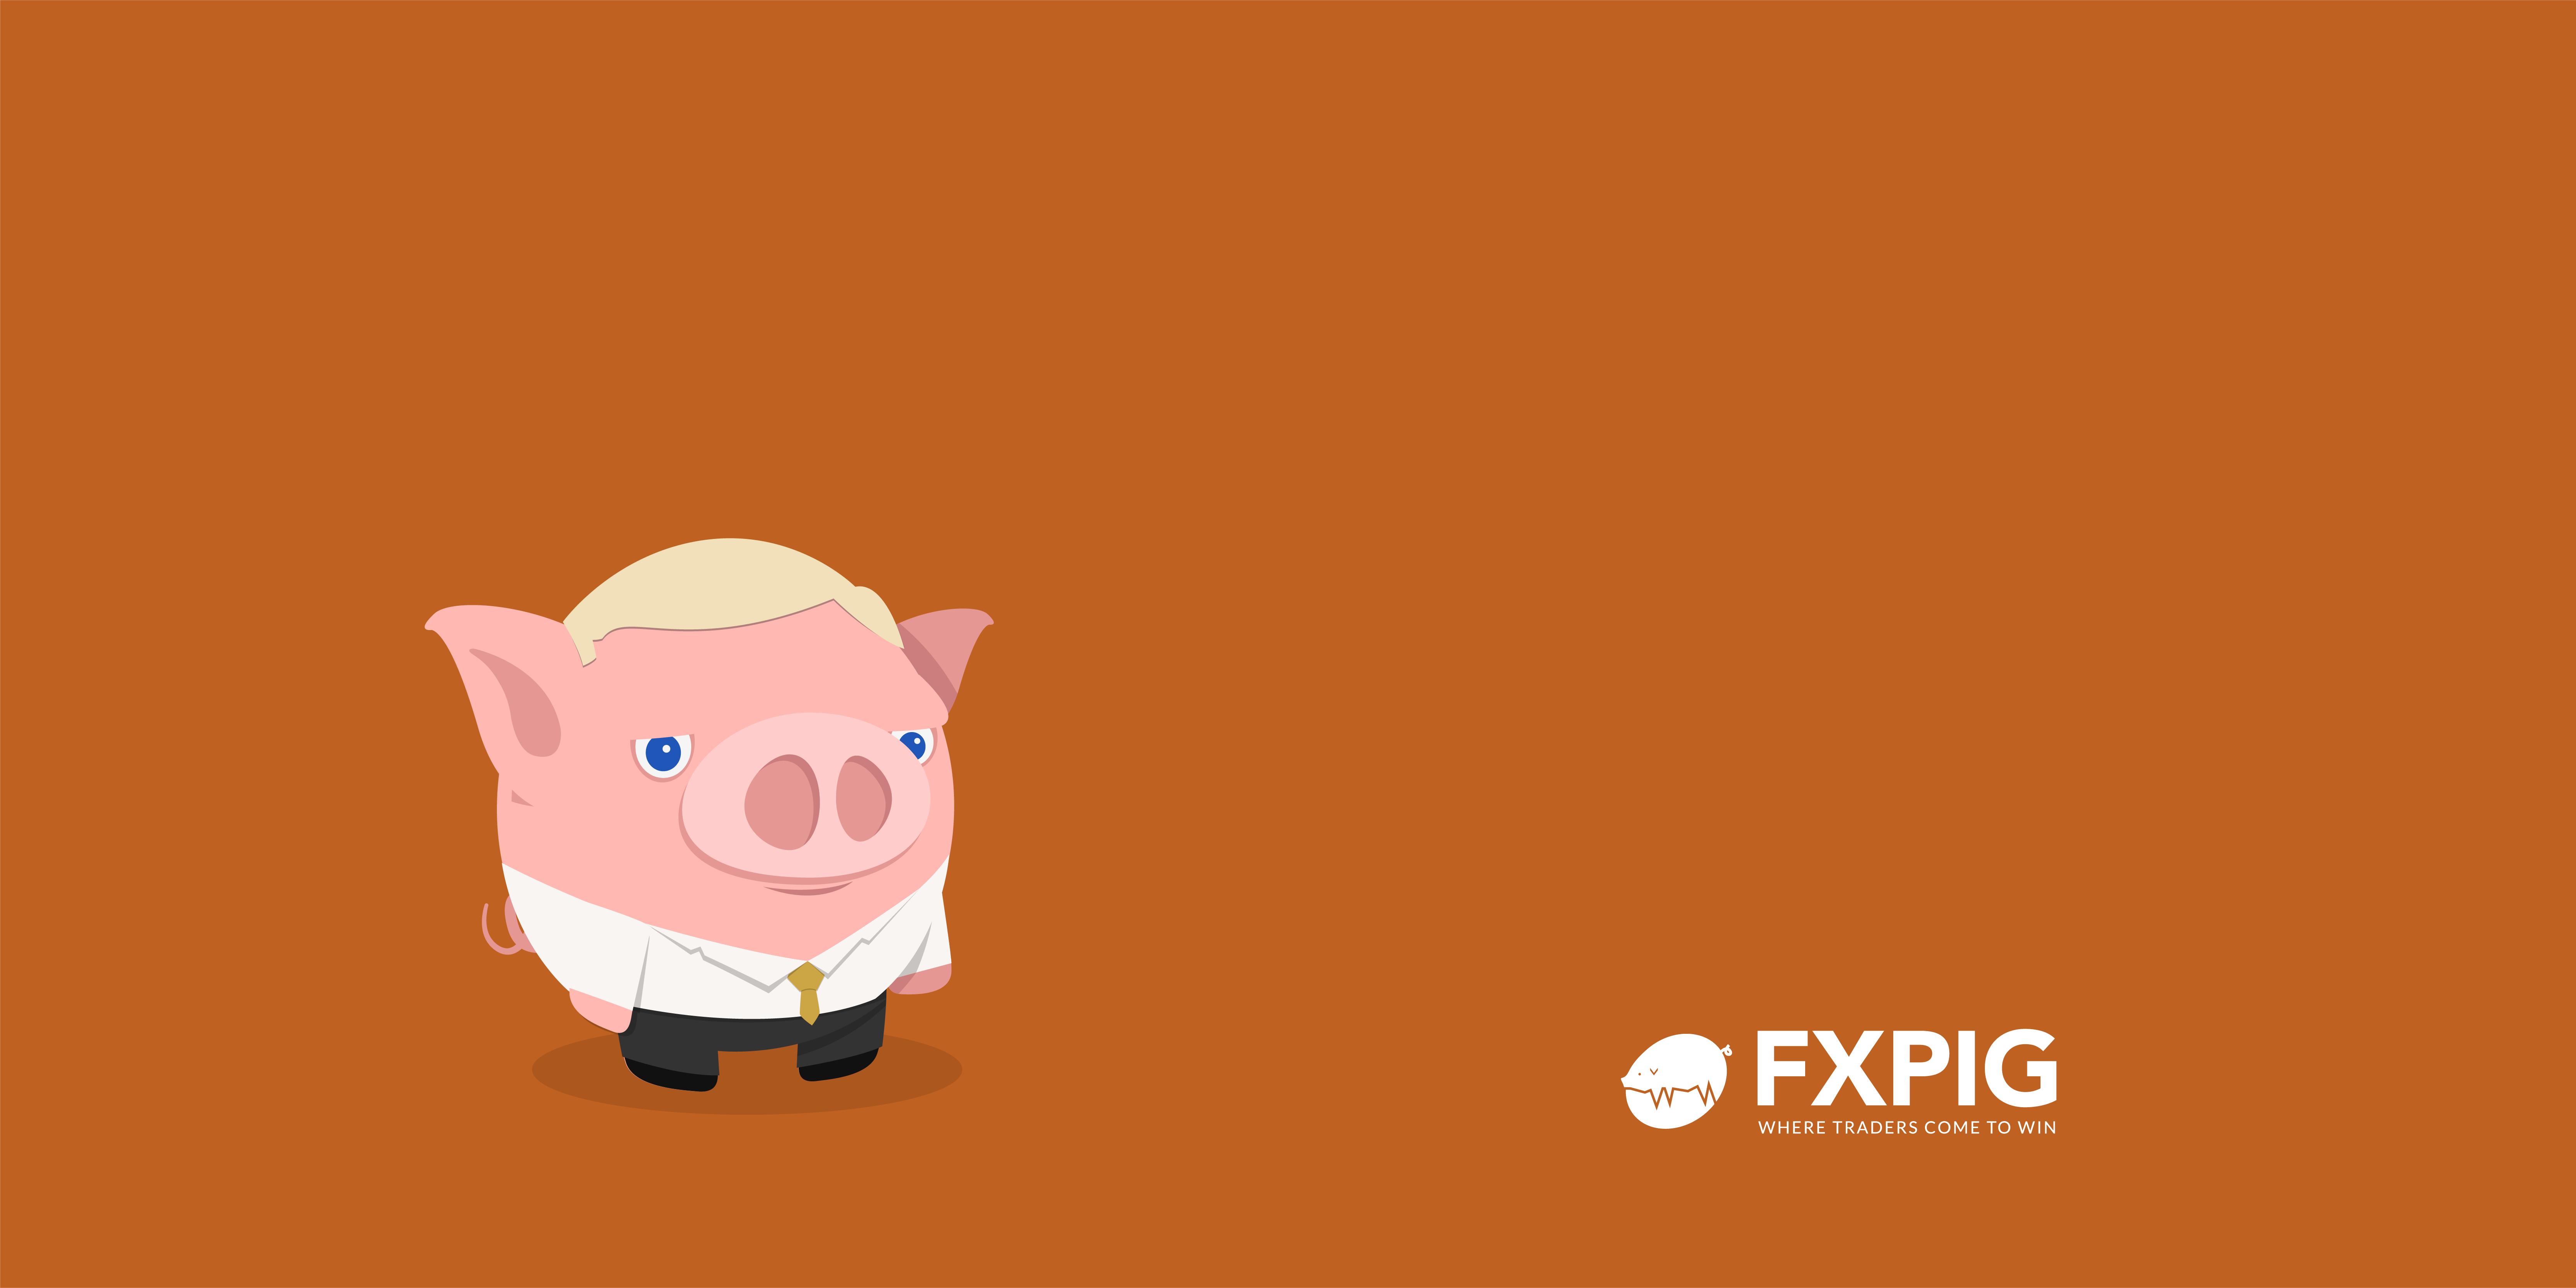 FOREX_wisdom_trading-risk-winning-meaningfuly_Ed-Seykota_FXPIG